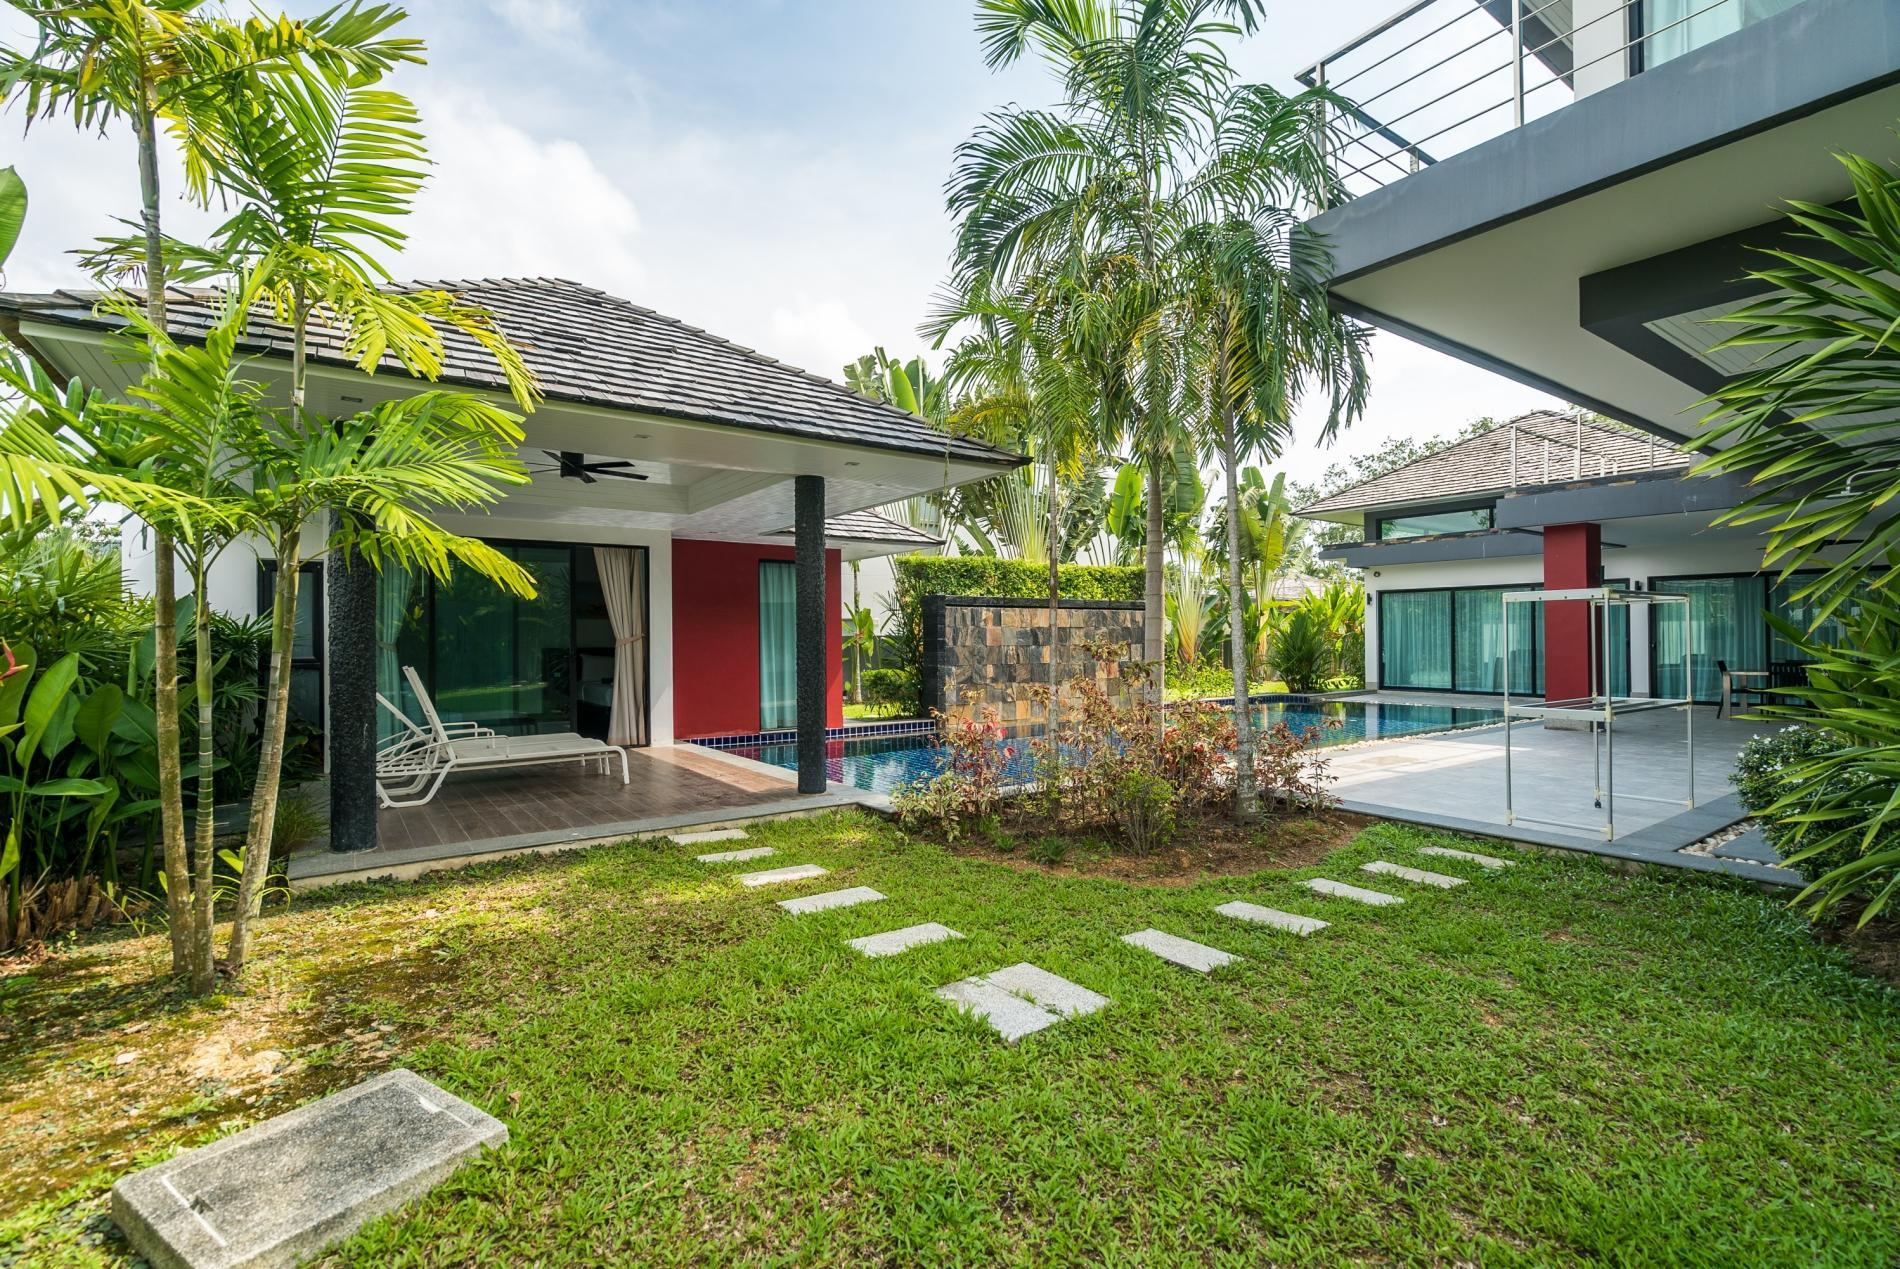 Apartment Diamond 272 - Modern 4 br private pool and garden villa photo 26956870